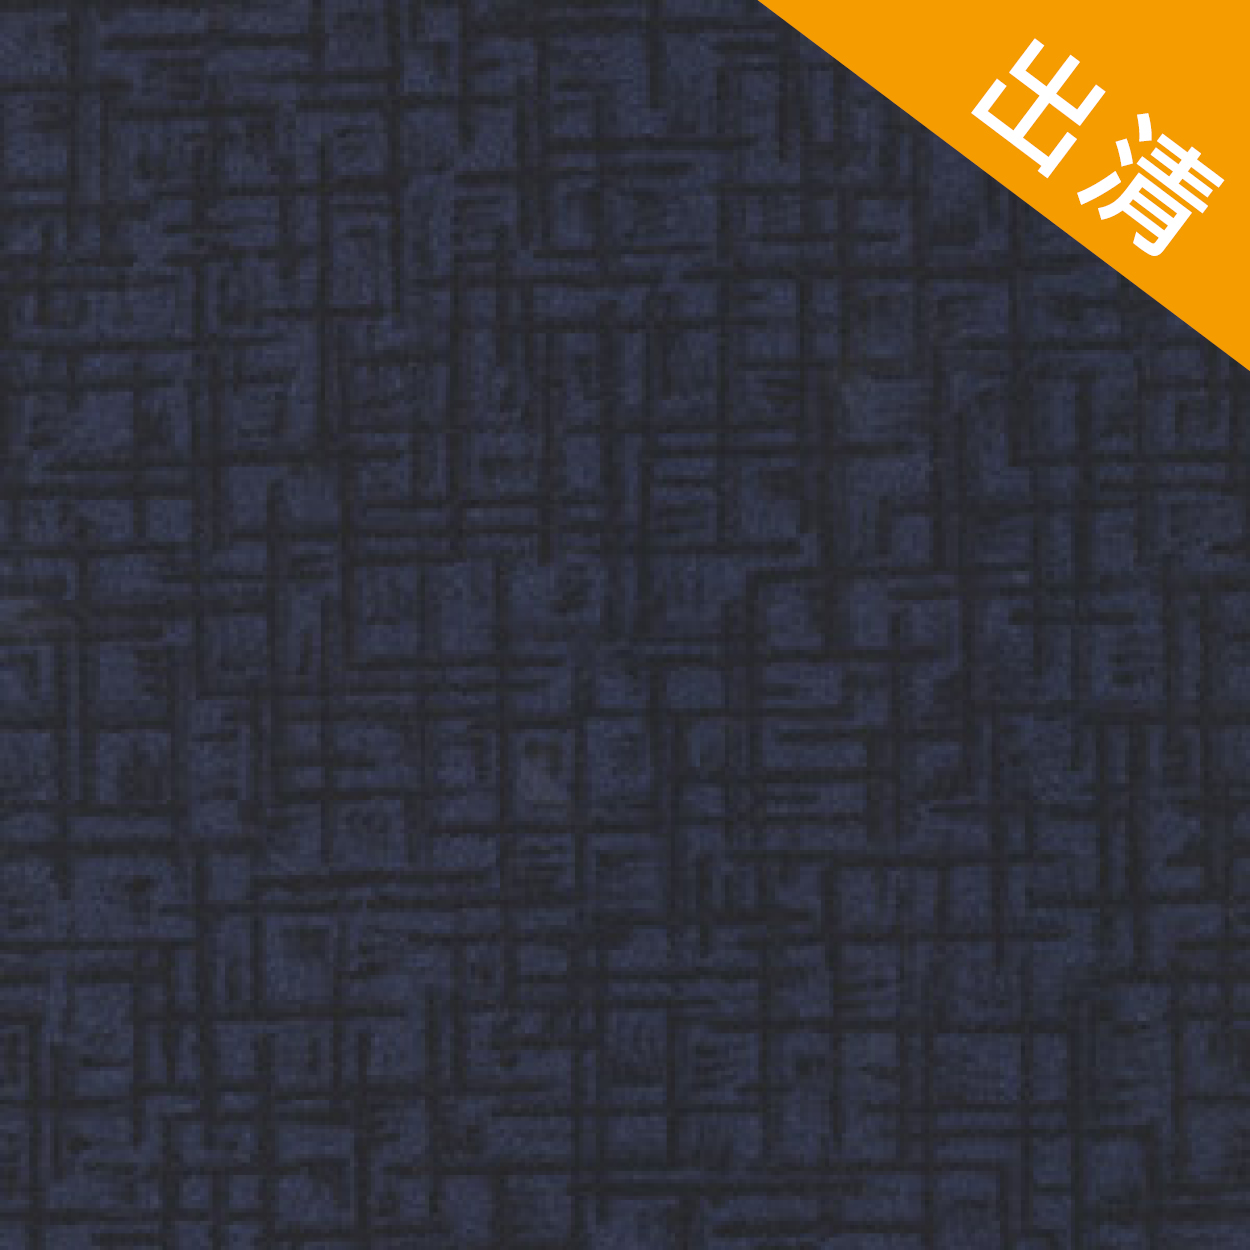 Flotex Senya  英國靜電植絨方塊地毯 現貨/售完為止(共3色) 100% Nylon 50 x 50 cm